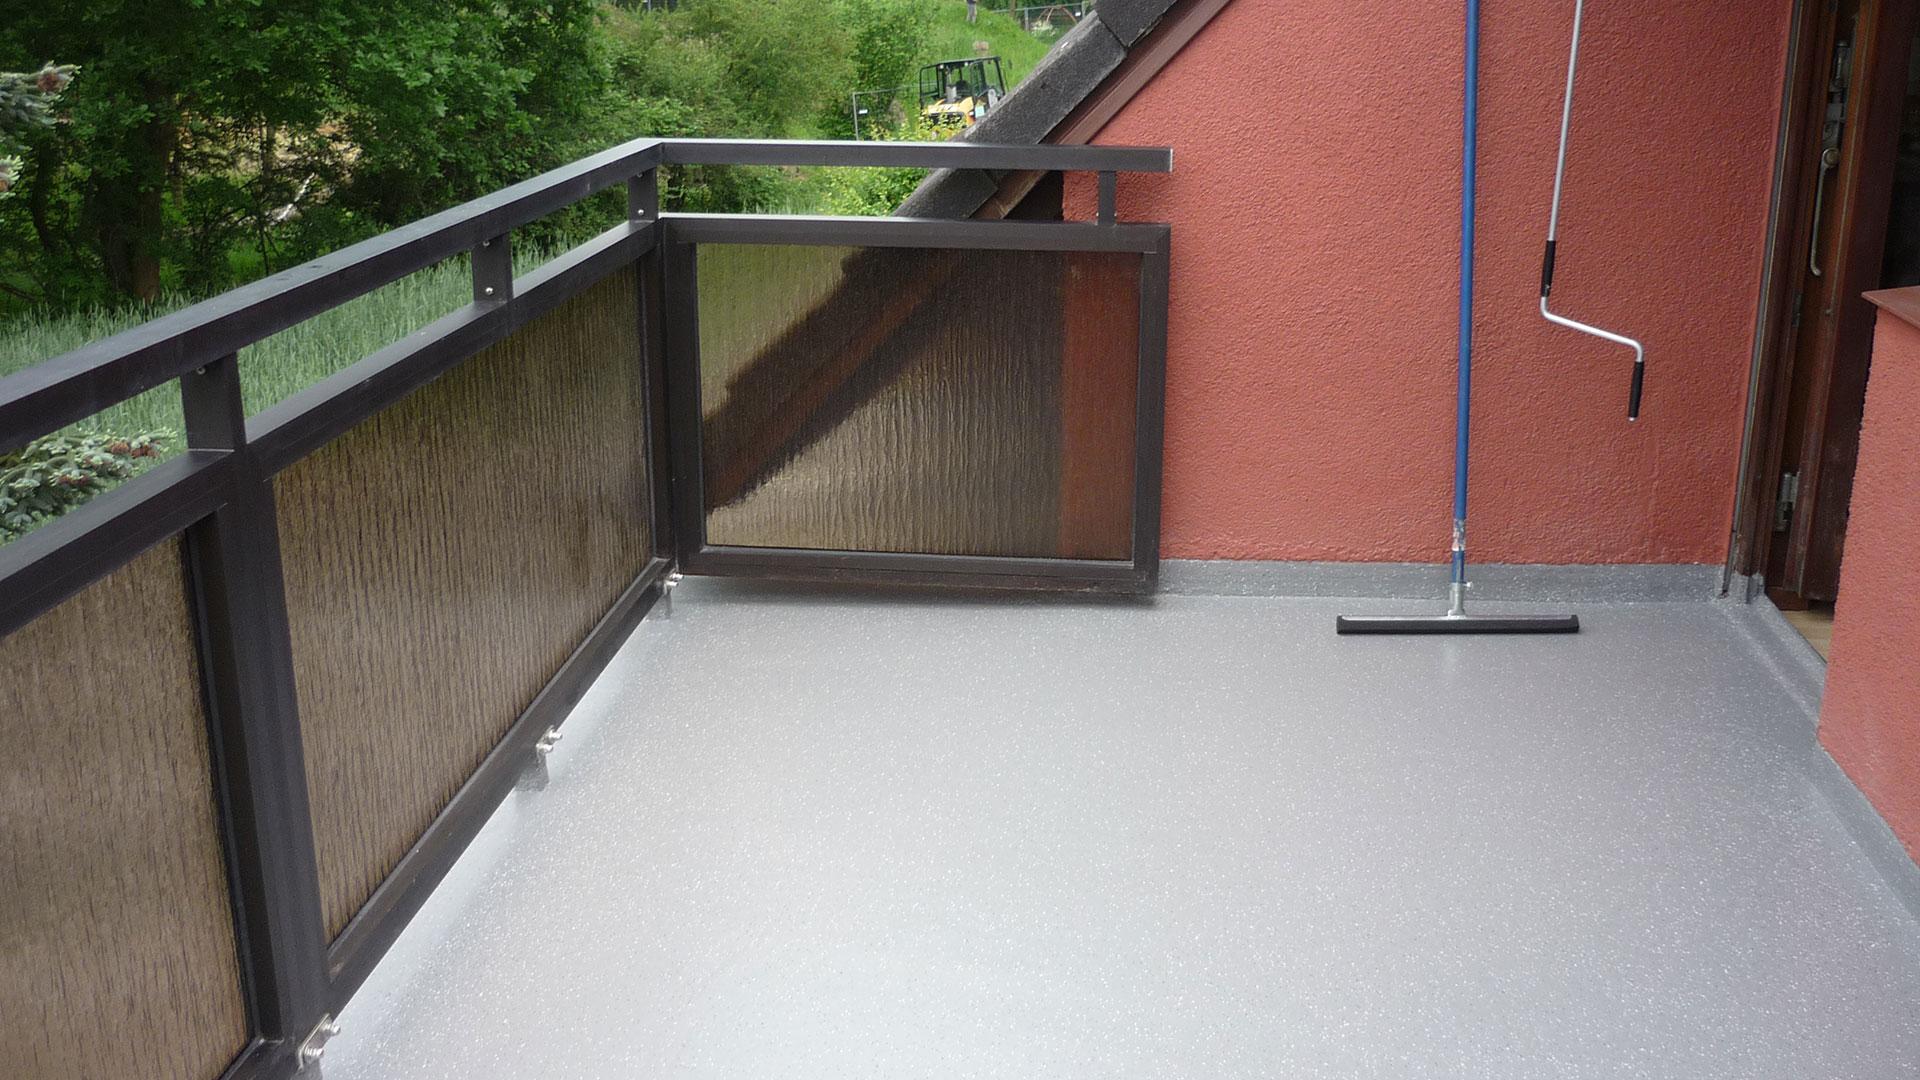 Sanierter Balkon in Osterholz 1920x1080px | Dachdeckerei Spalek OHZ